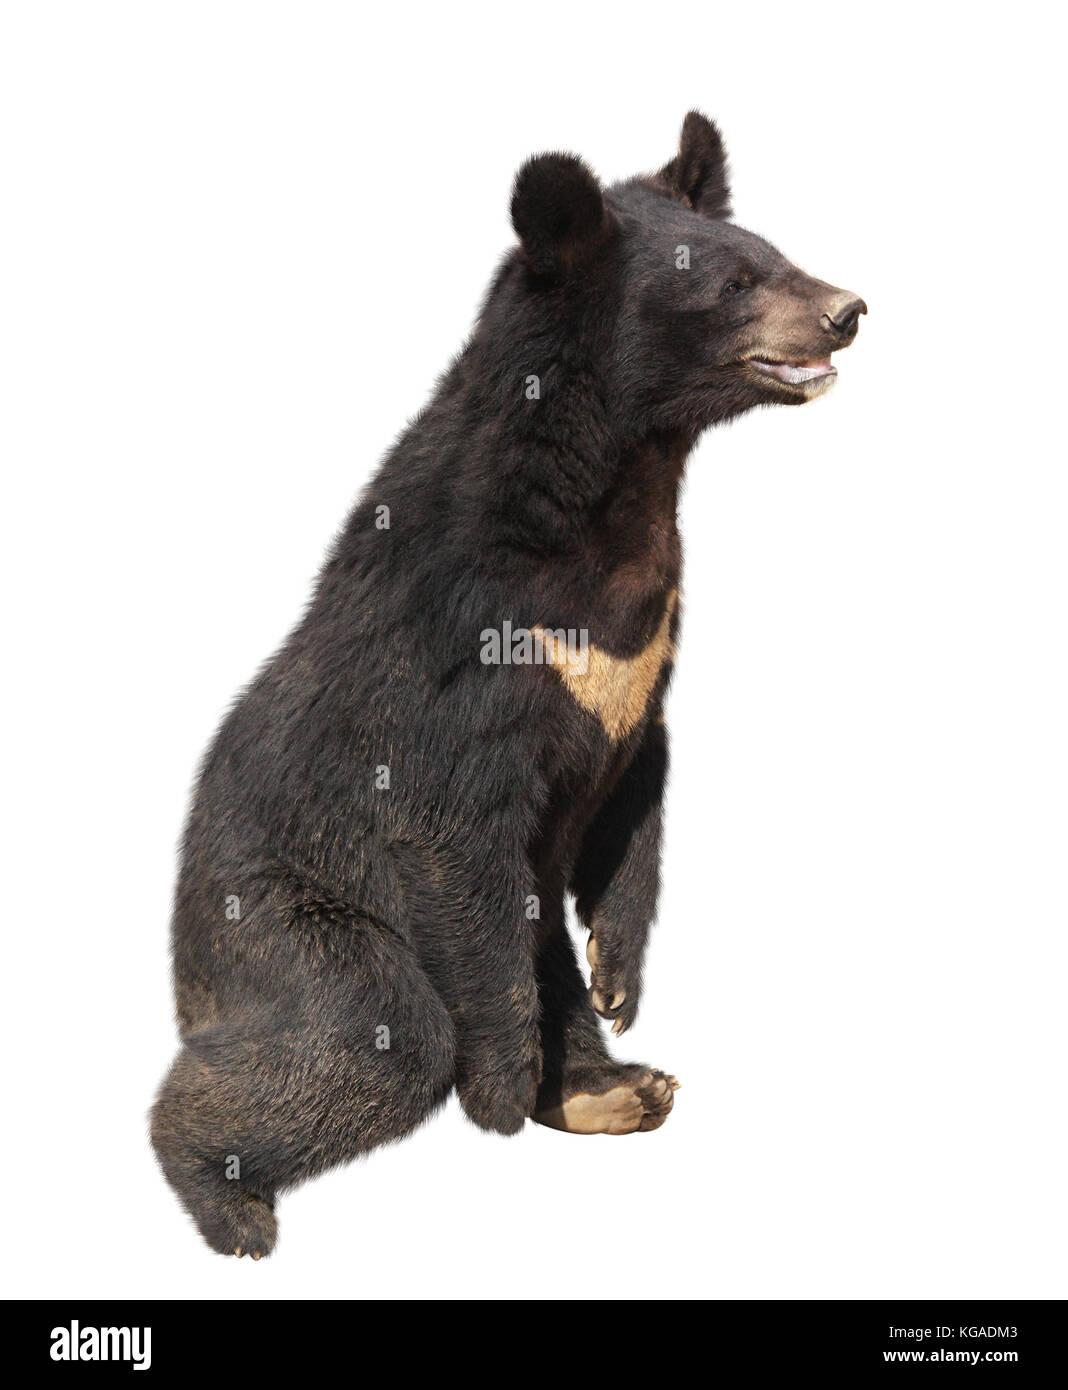 Asiatic black bear (himalayan bear, ursus thibetanus). Isolated on white background - Stock Image